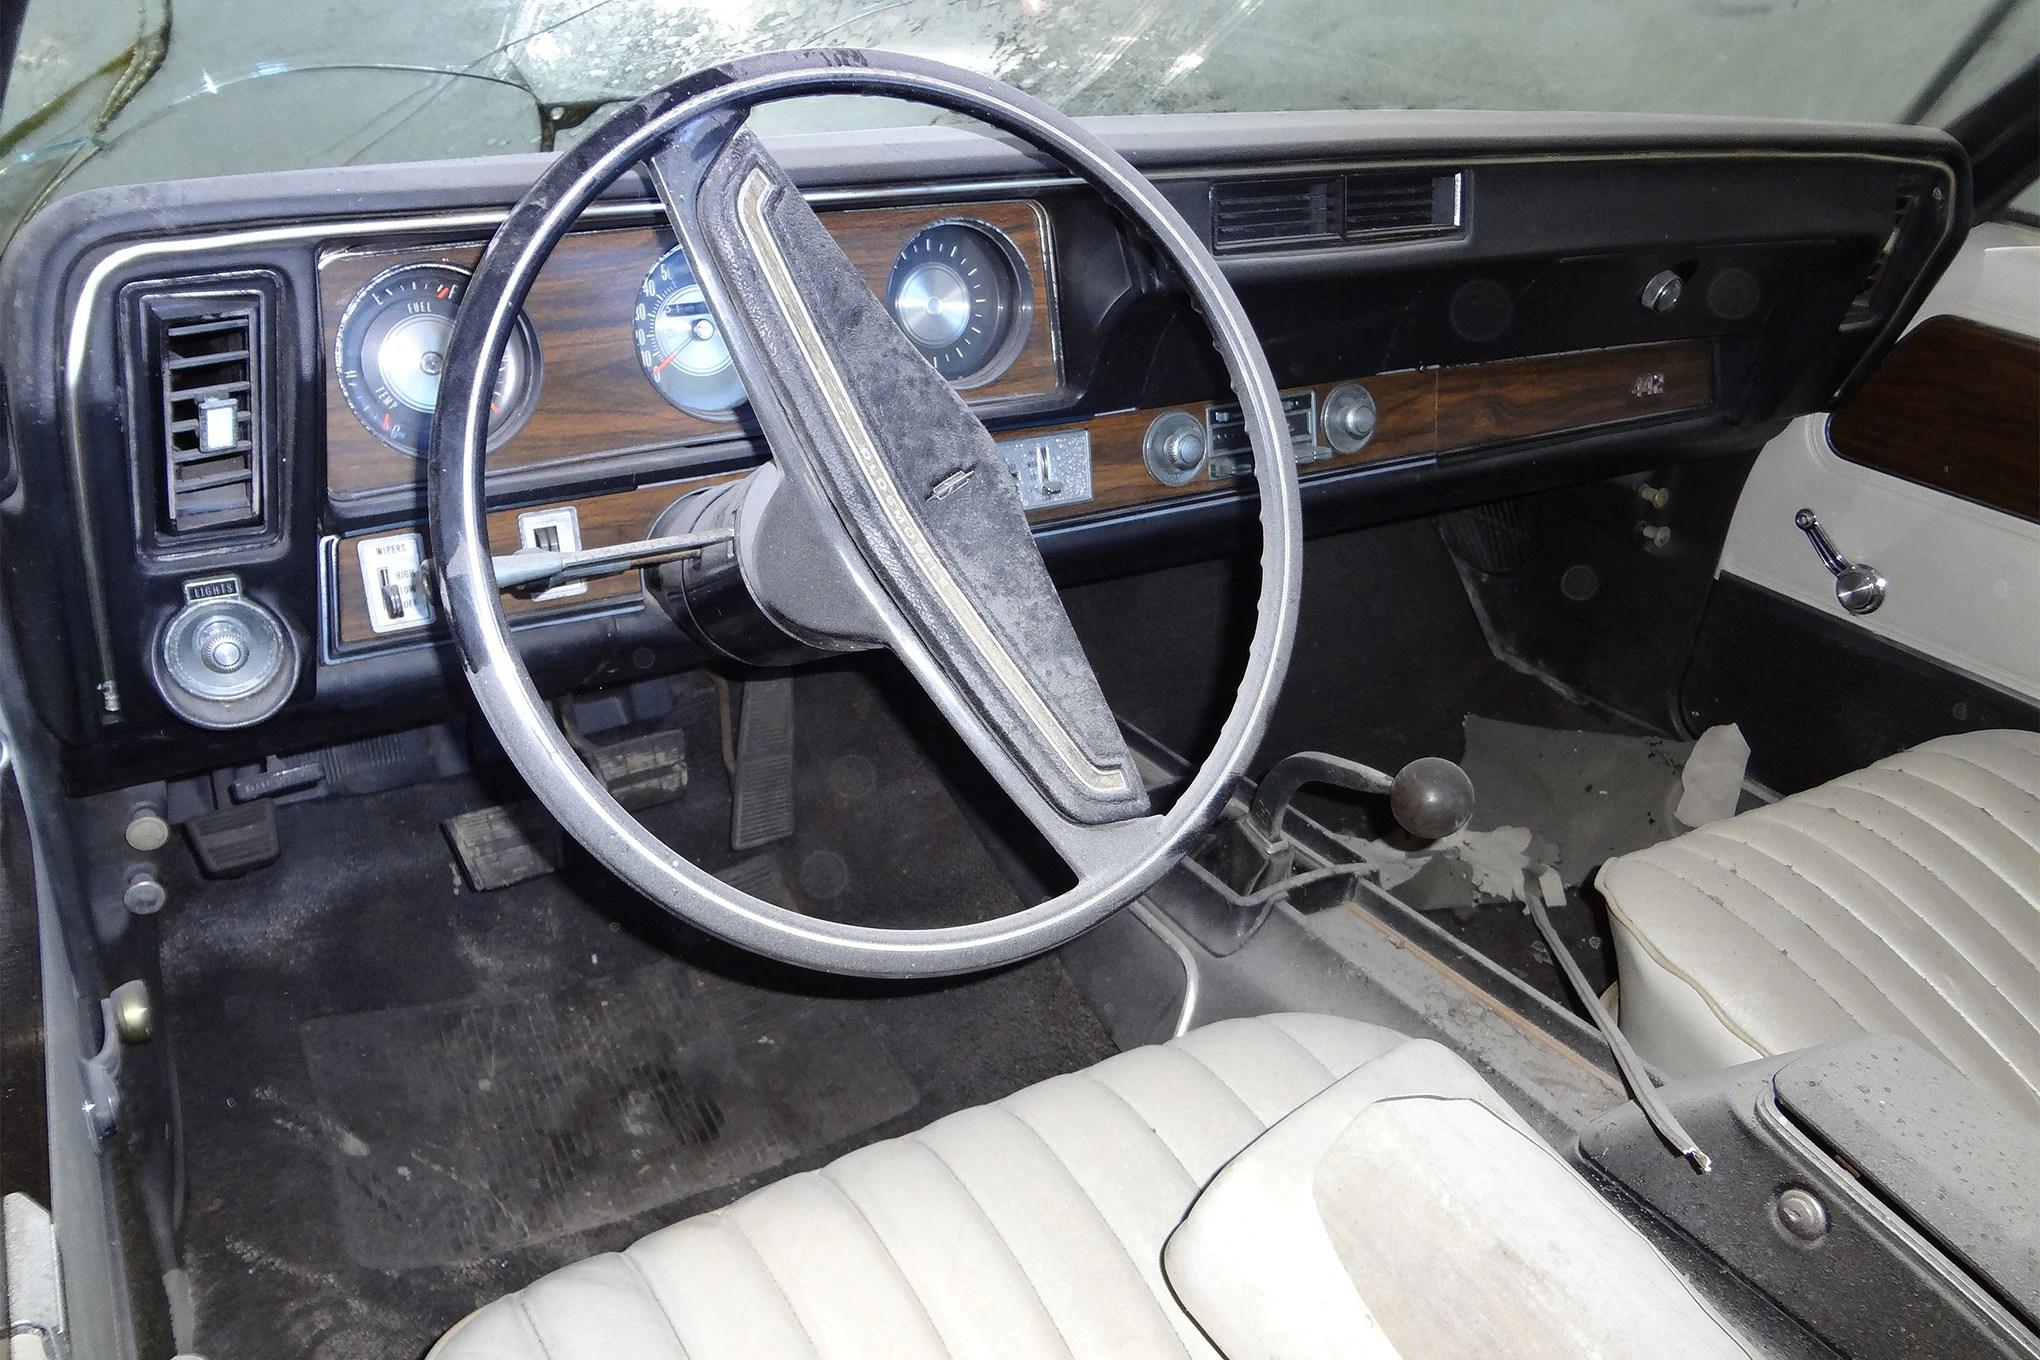 1971-oldsmobile-442-convertible-dash-view